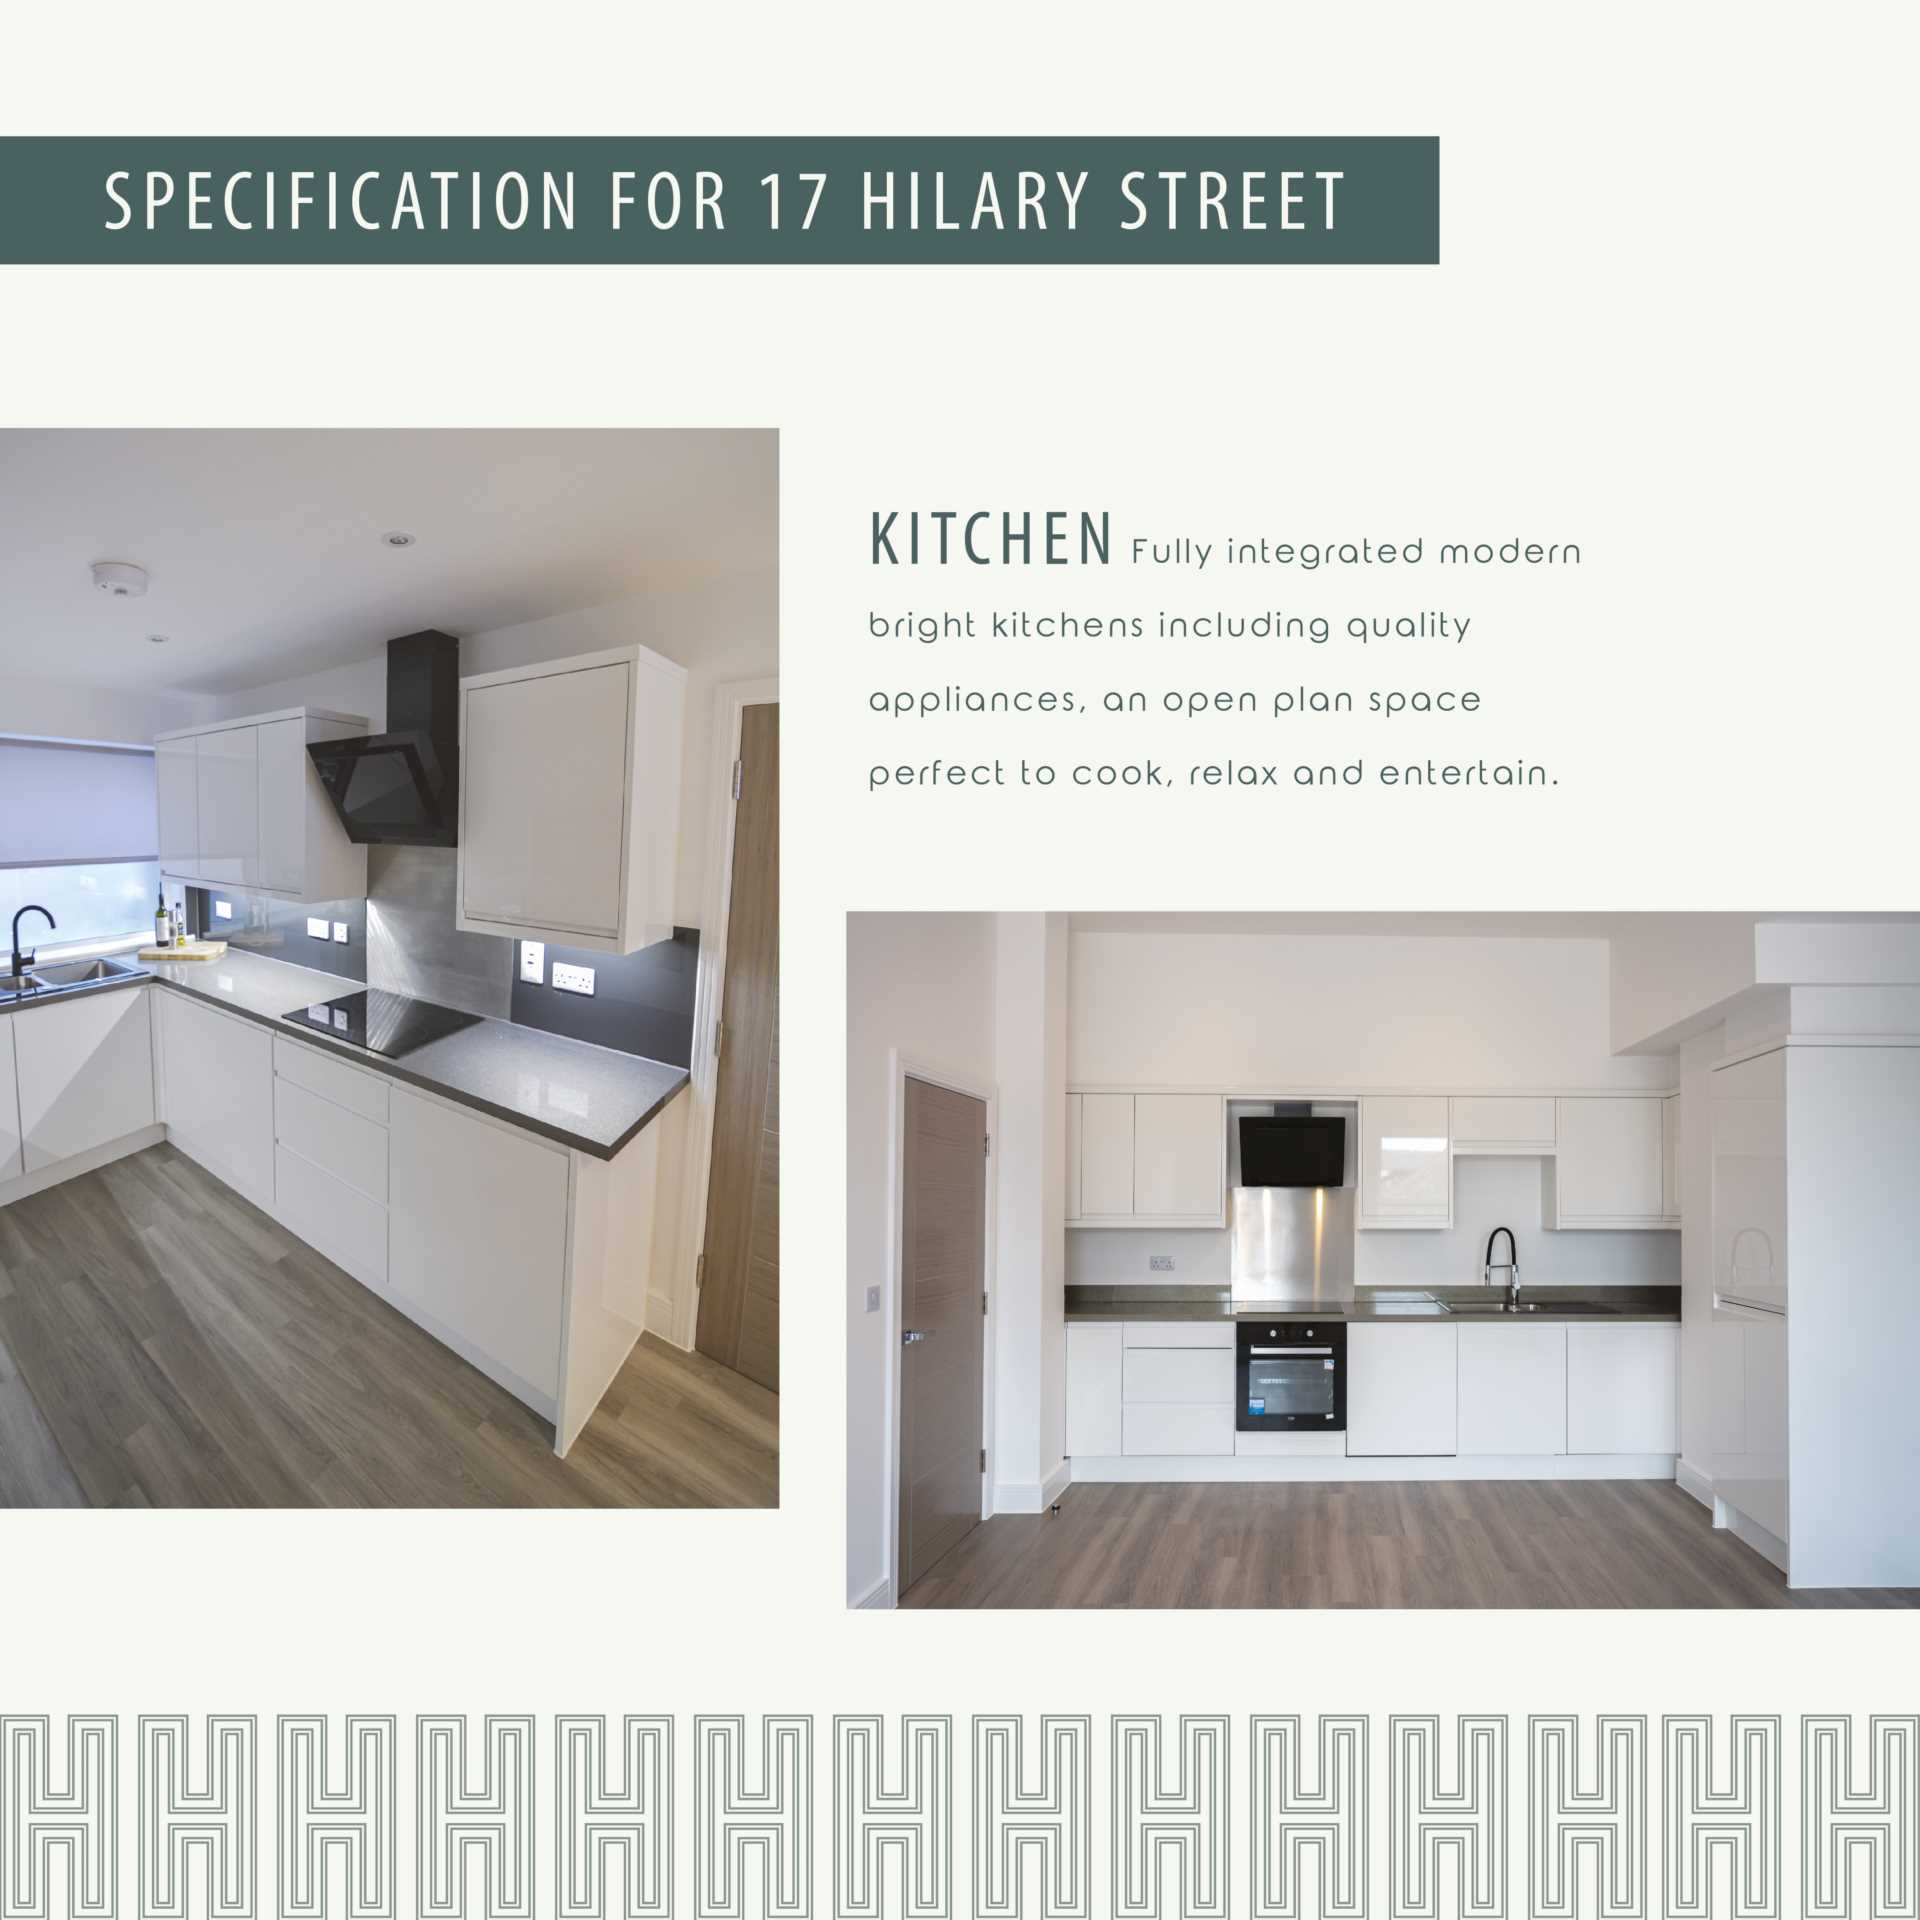 Flat 4, 17 Hilary Street, Image 4